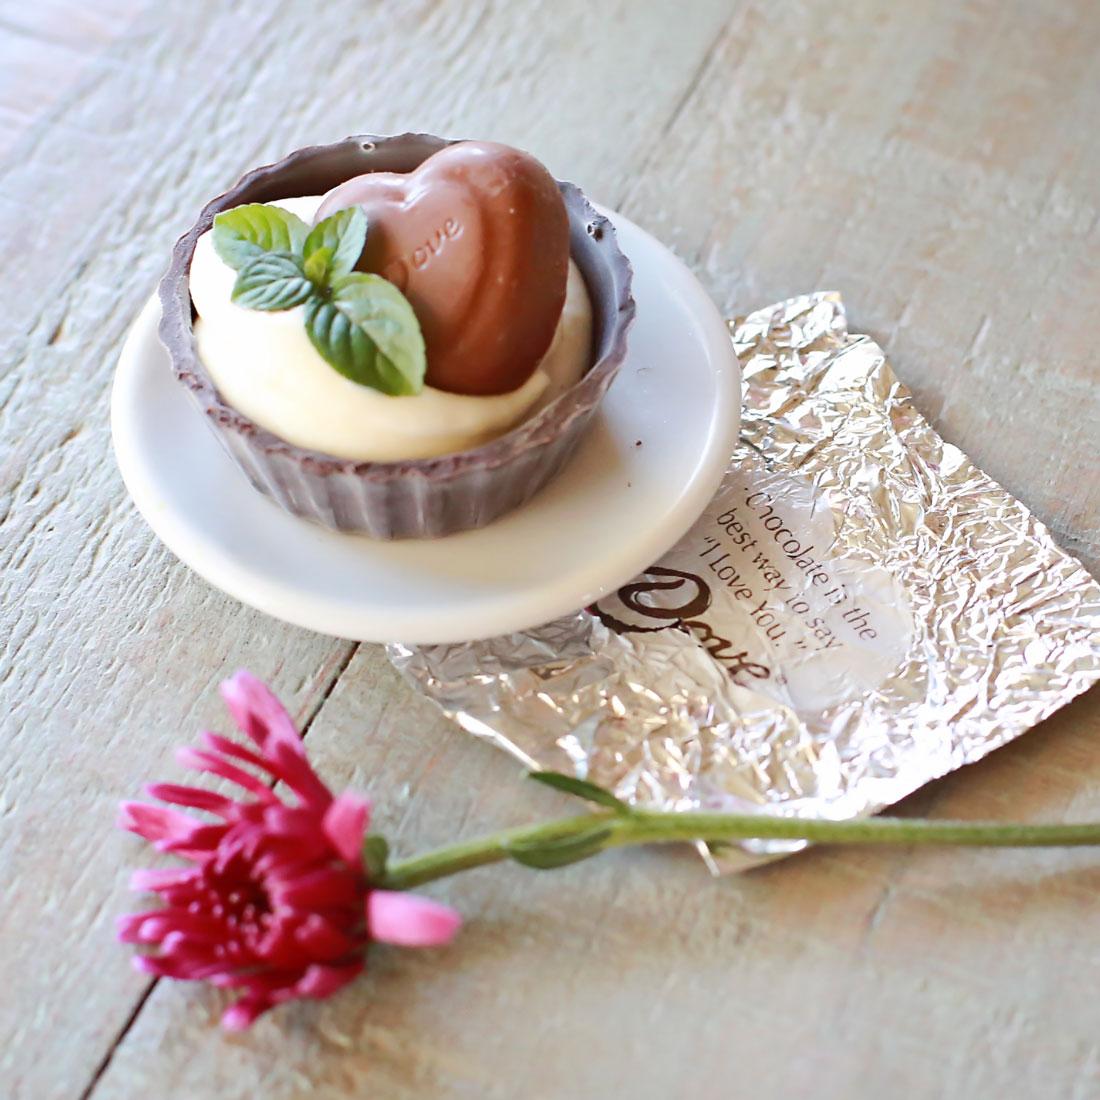 Miniature Chocolate Cheesecakes recipe